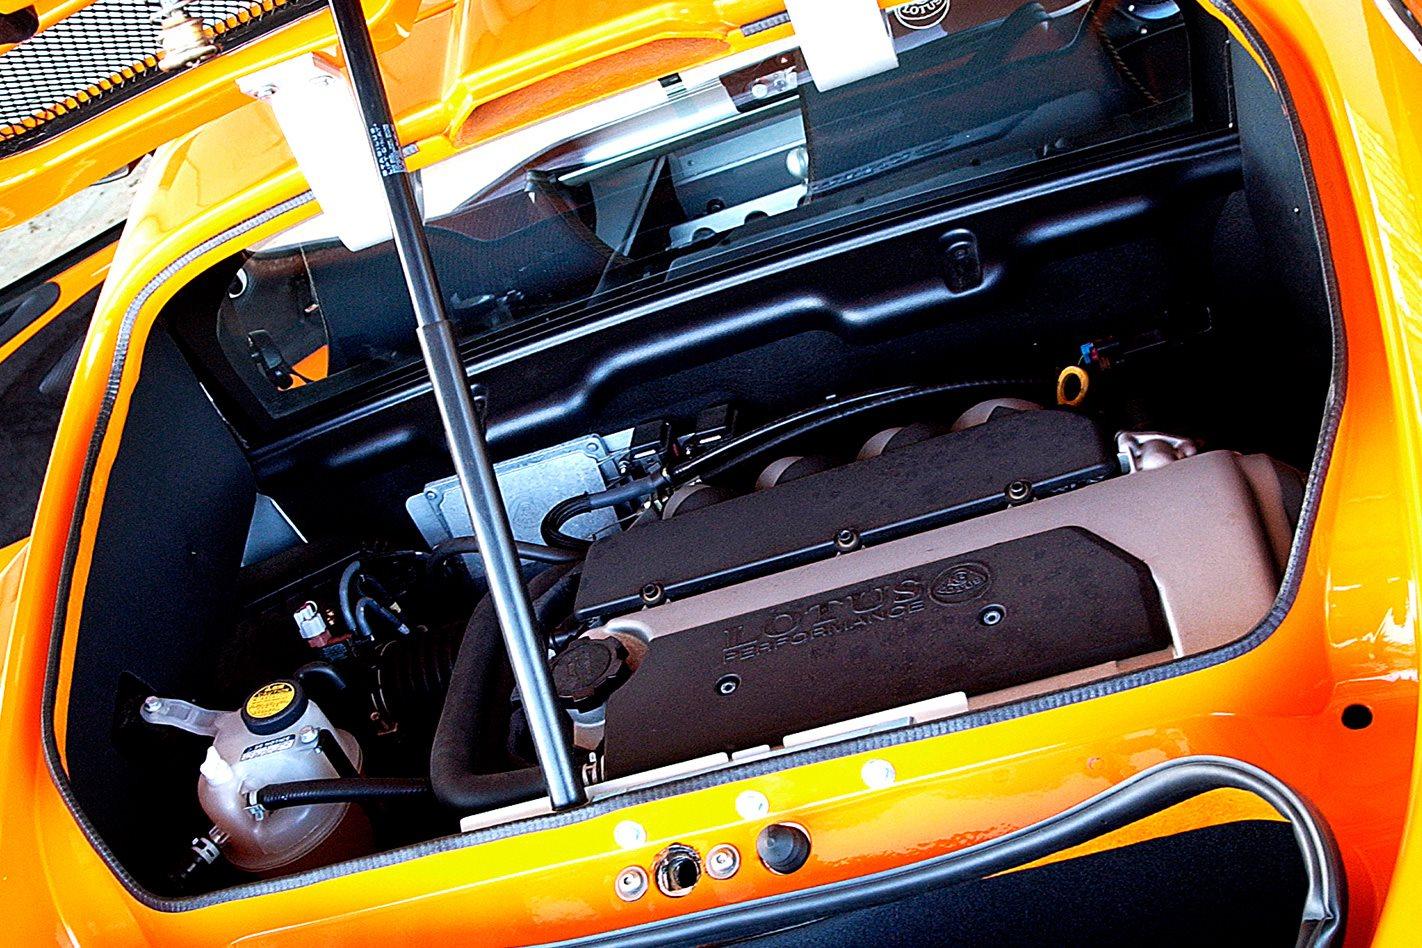 Lotus Exige engine